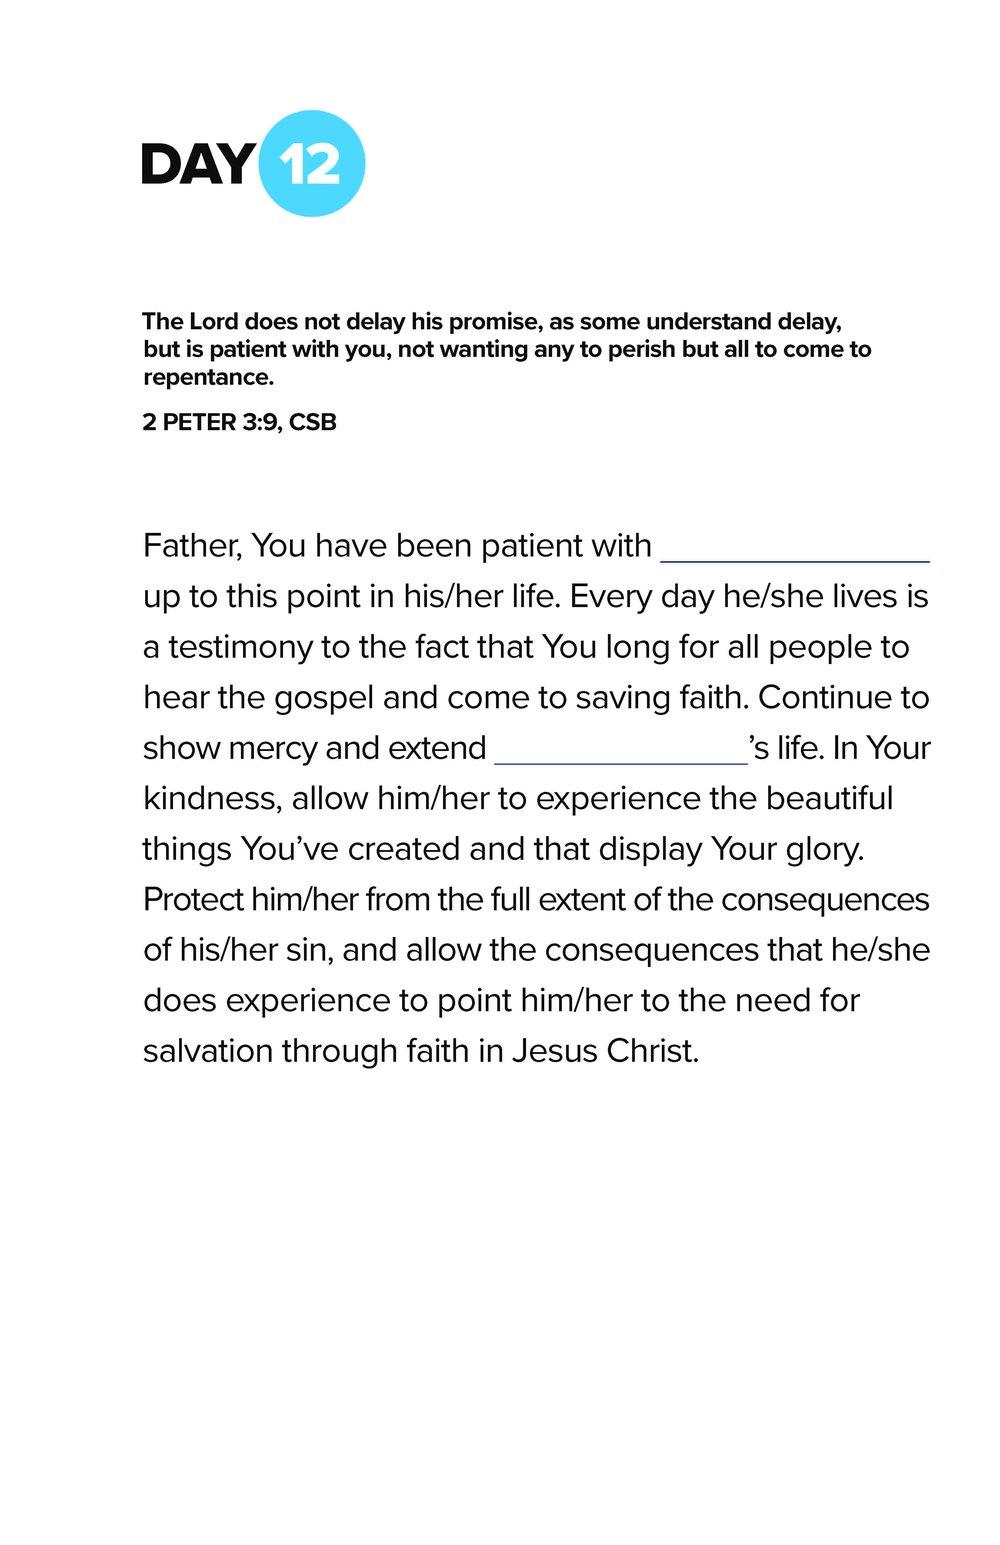 WhosYour1_Prayer-Guide_day12.jpg